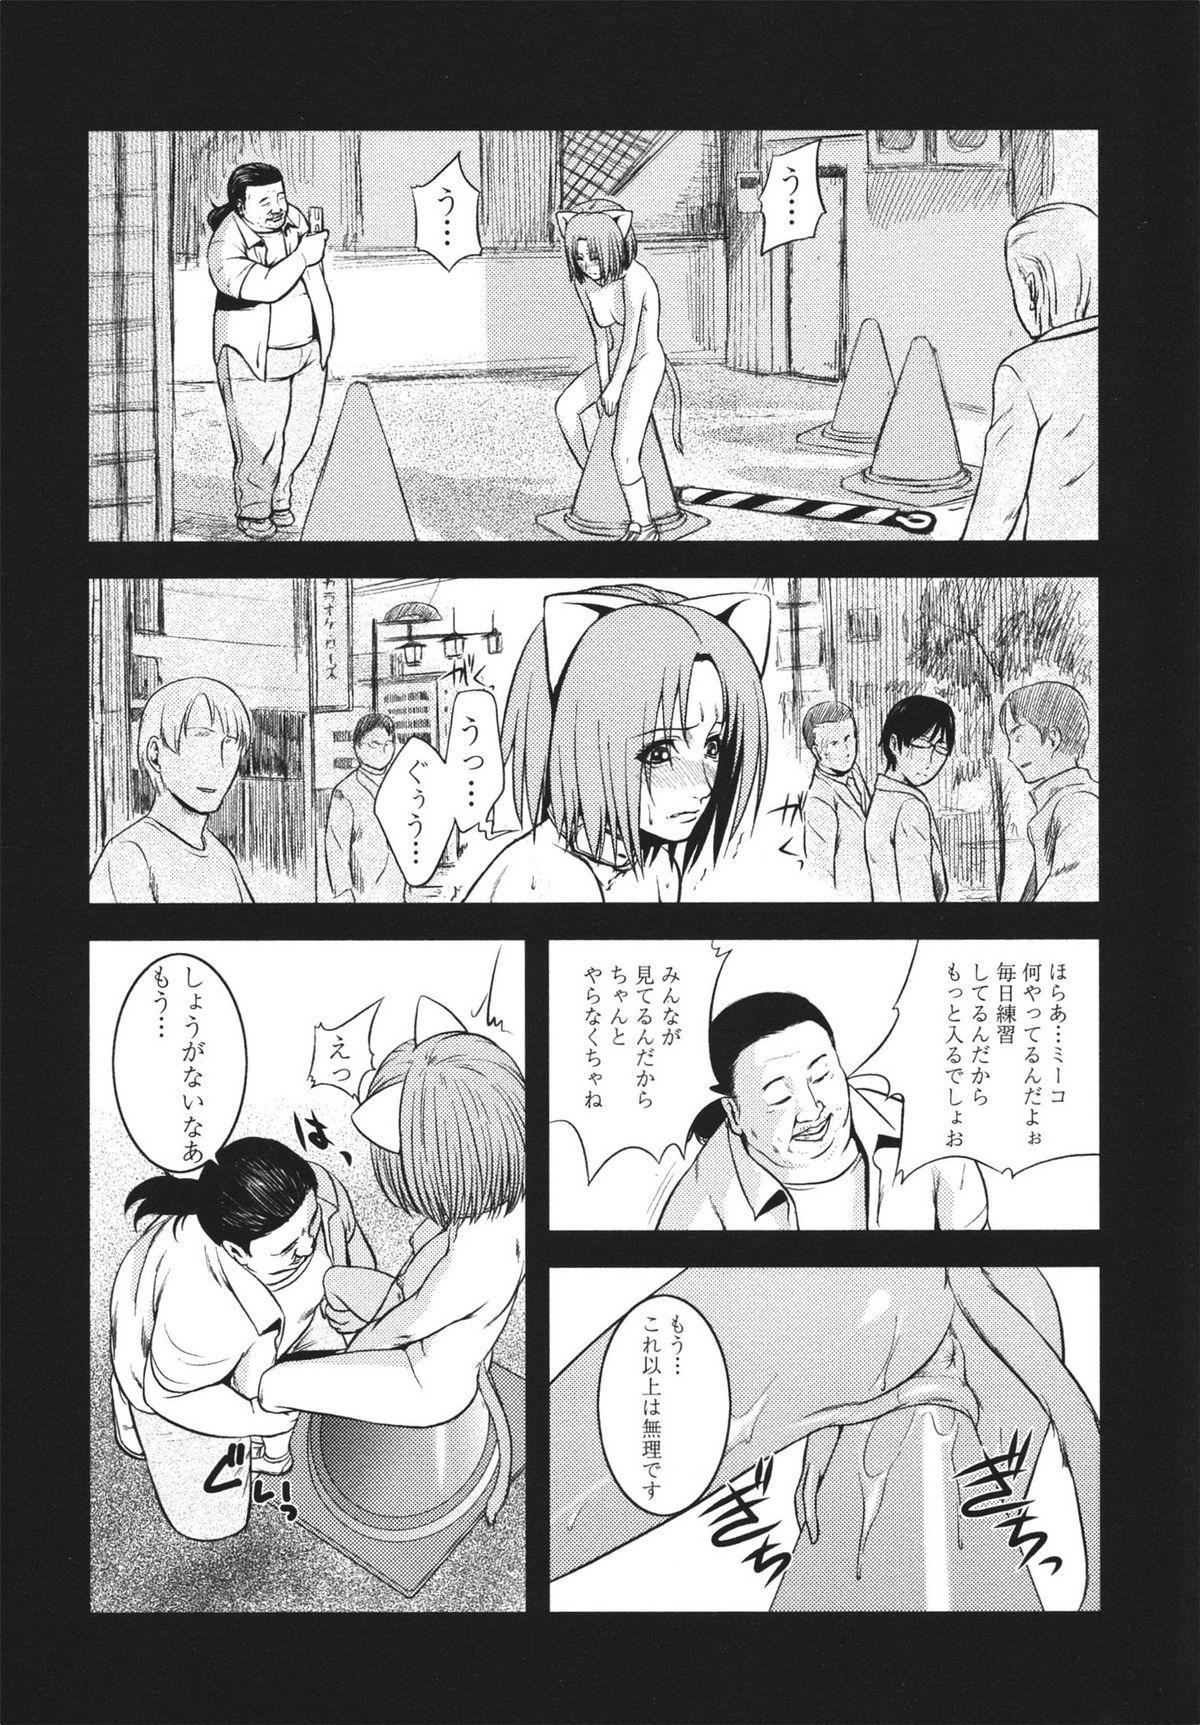 [Kawazuko Chouji] m7 -Minor Seven- Jou 185